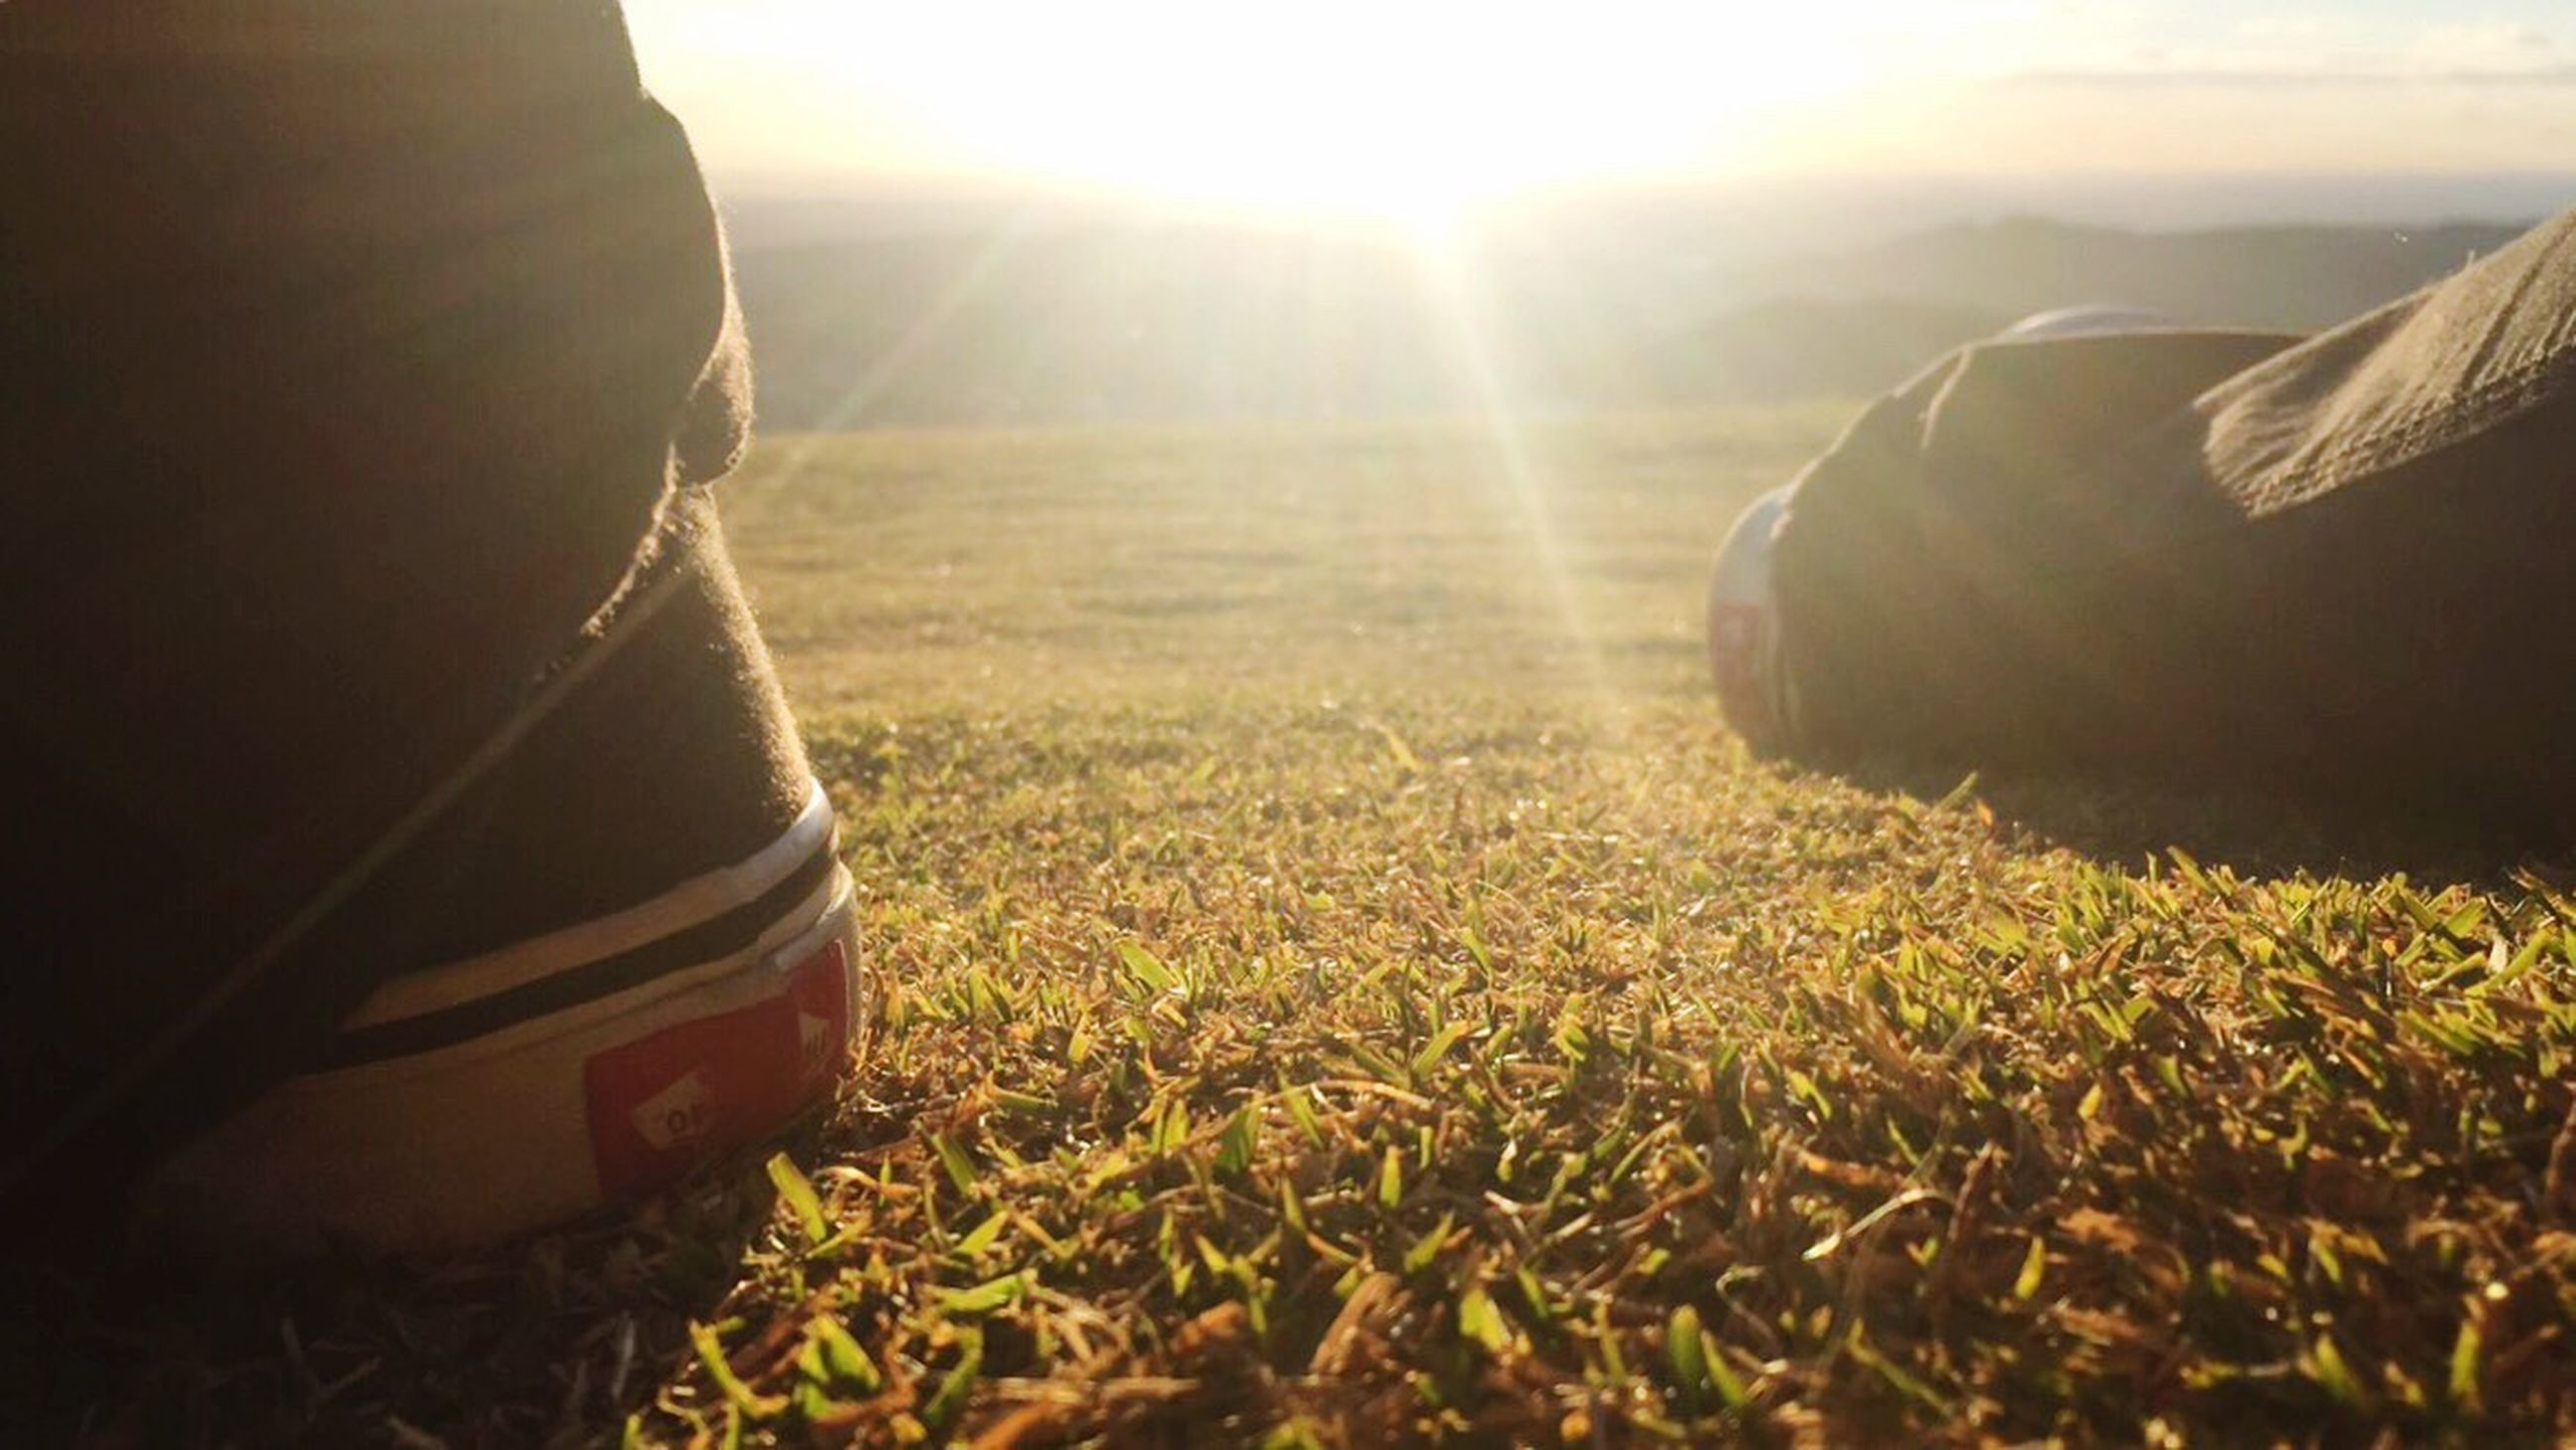 lens flare, sunlight, sunbeam, field, grass, sun, day, no people, outdoors, close-up, nature, sky